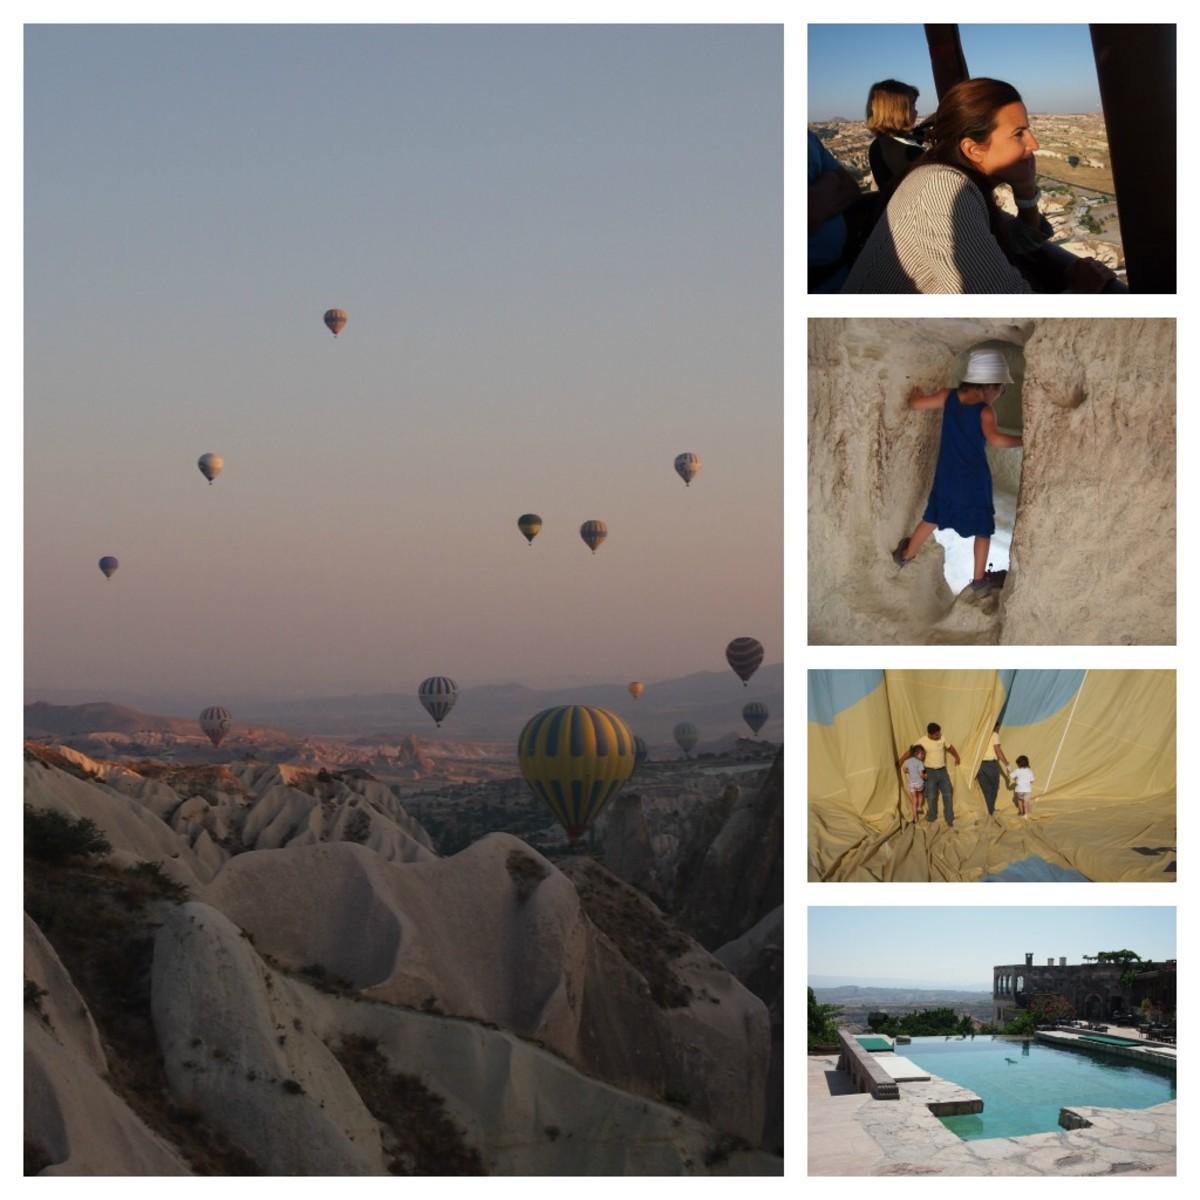 Balloon Collage